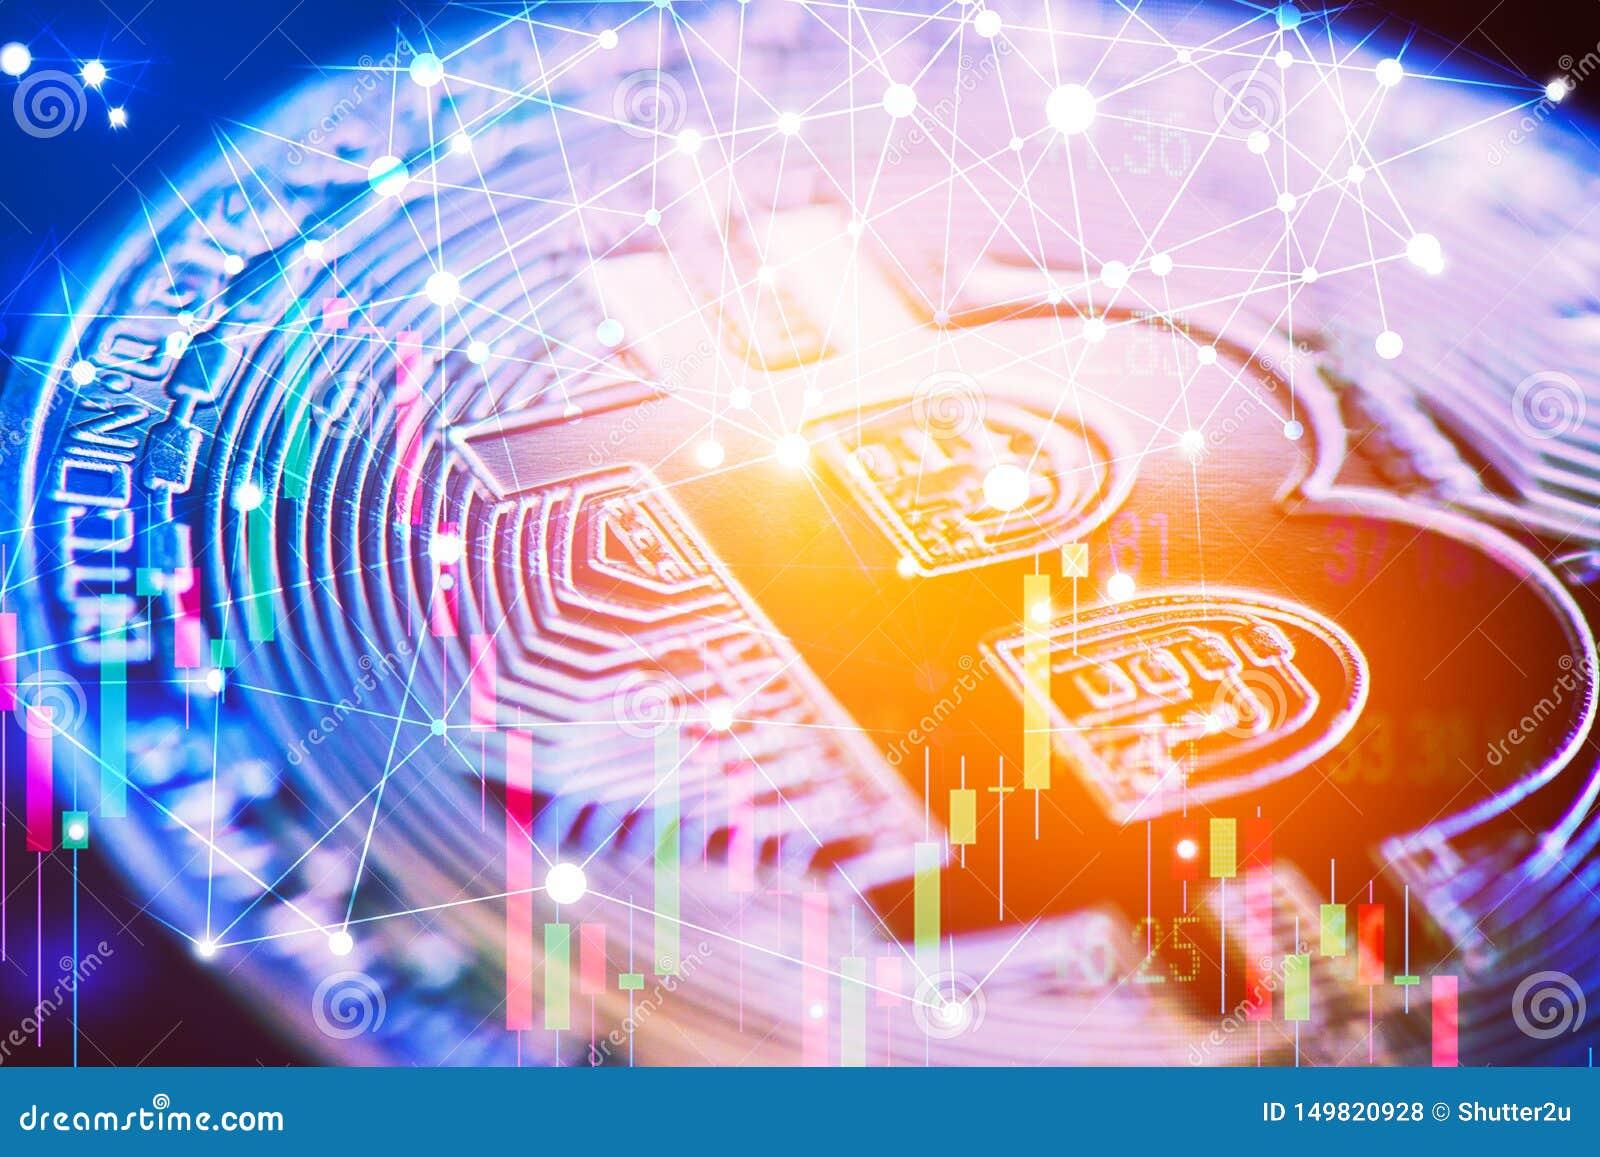 bitcoin trading company investment